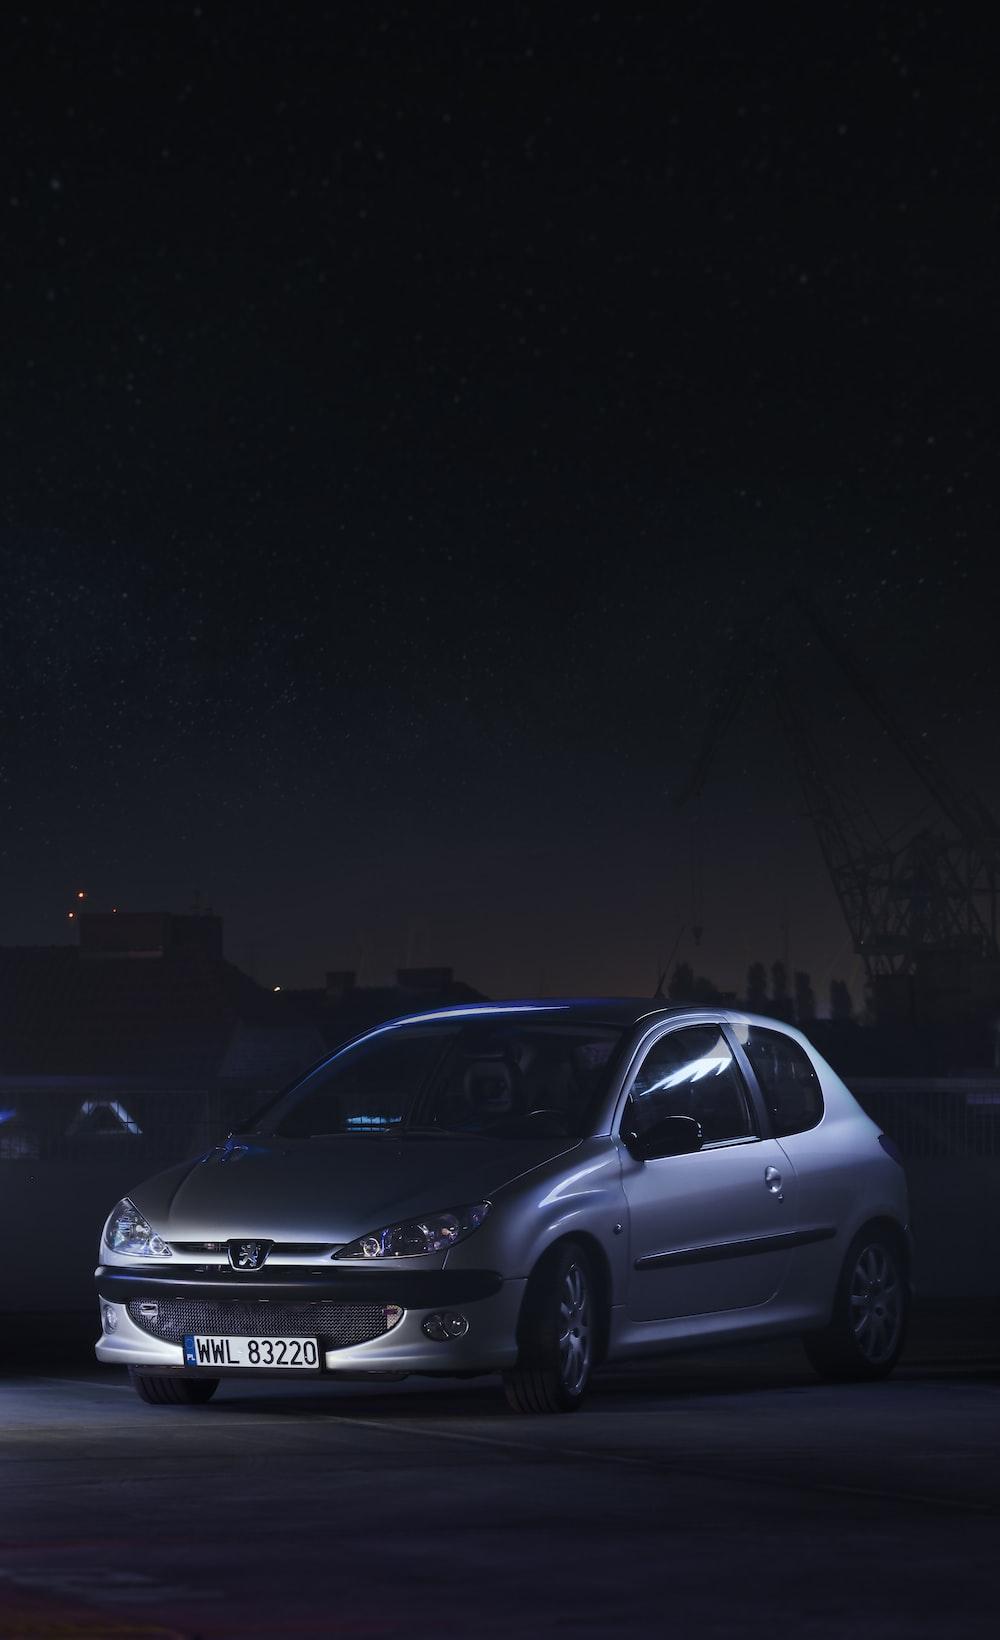 silver sedan on road during night time